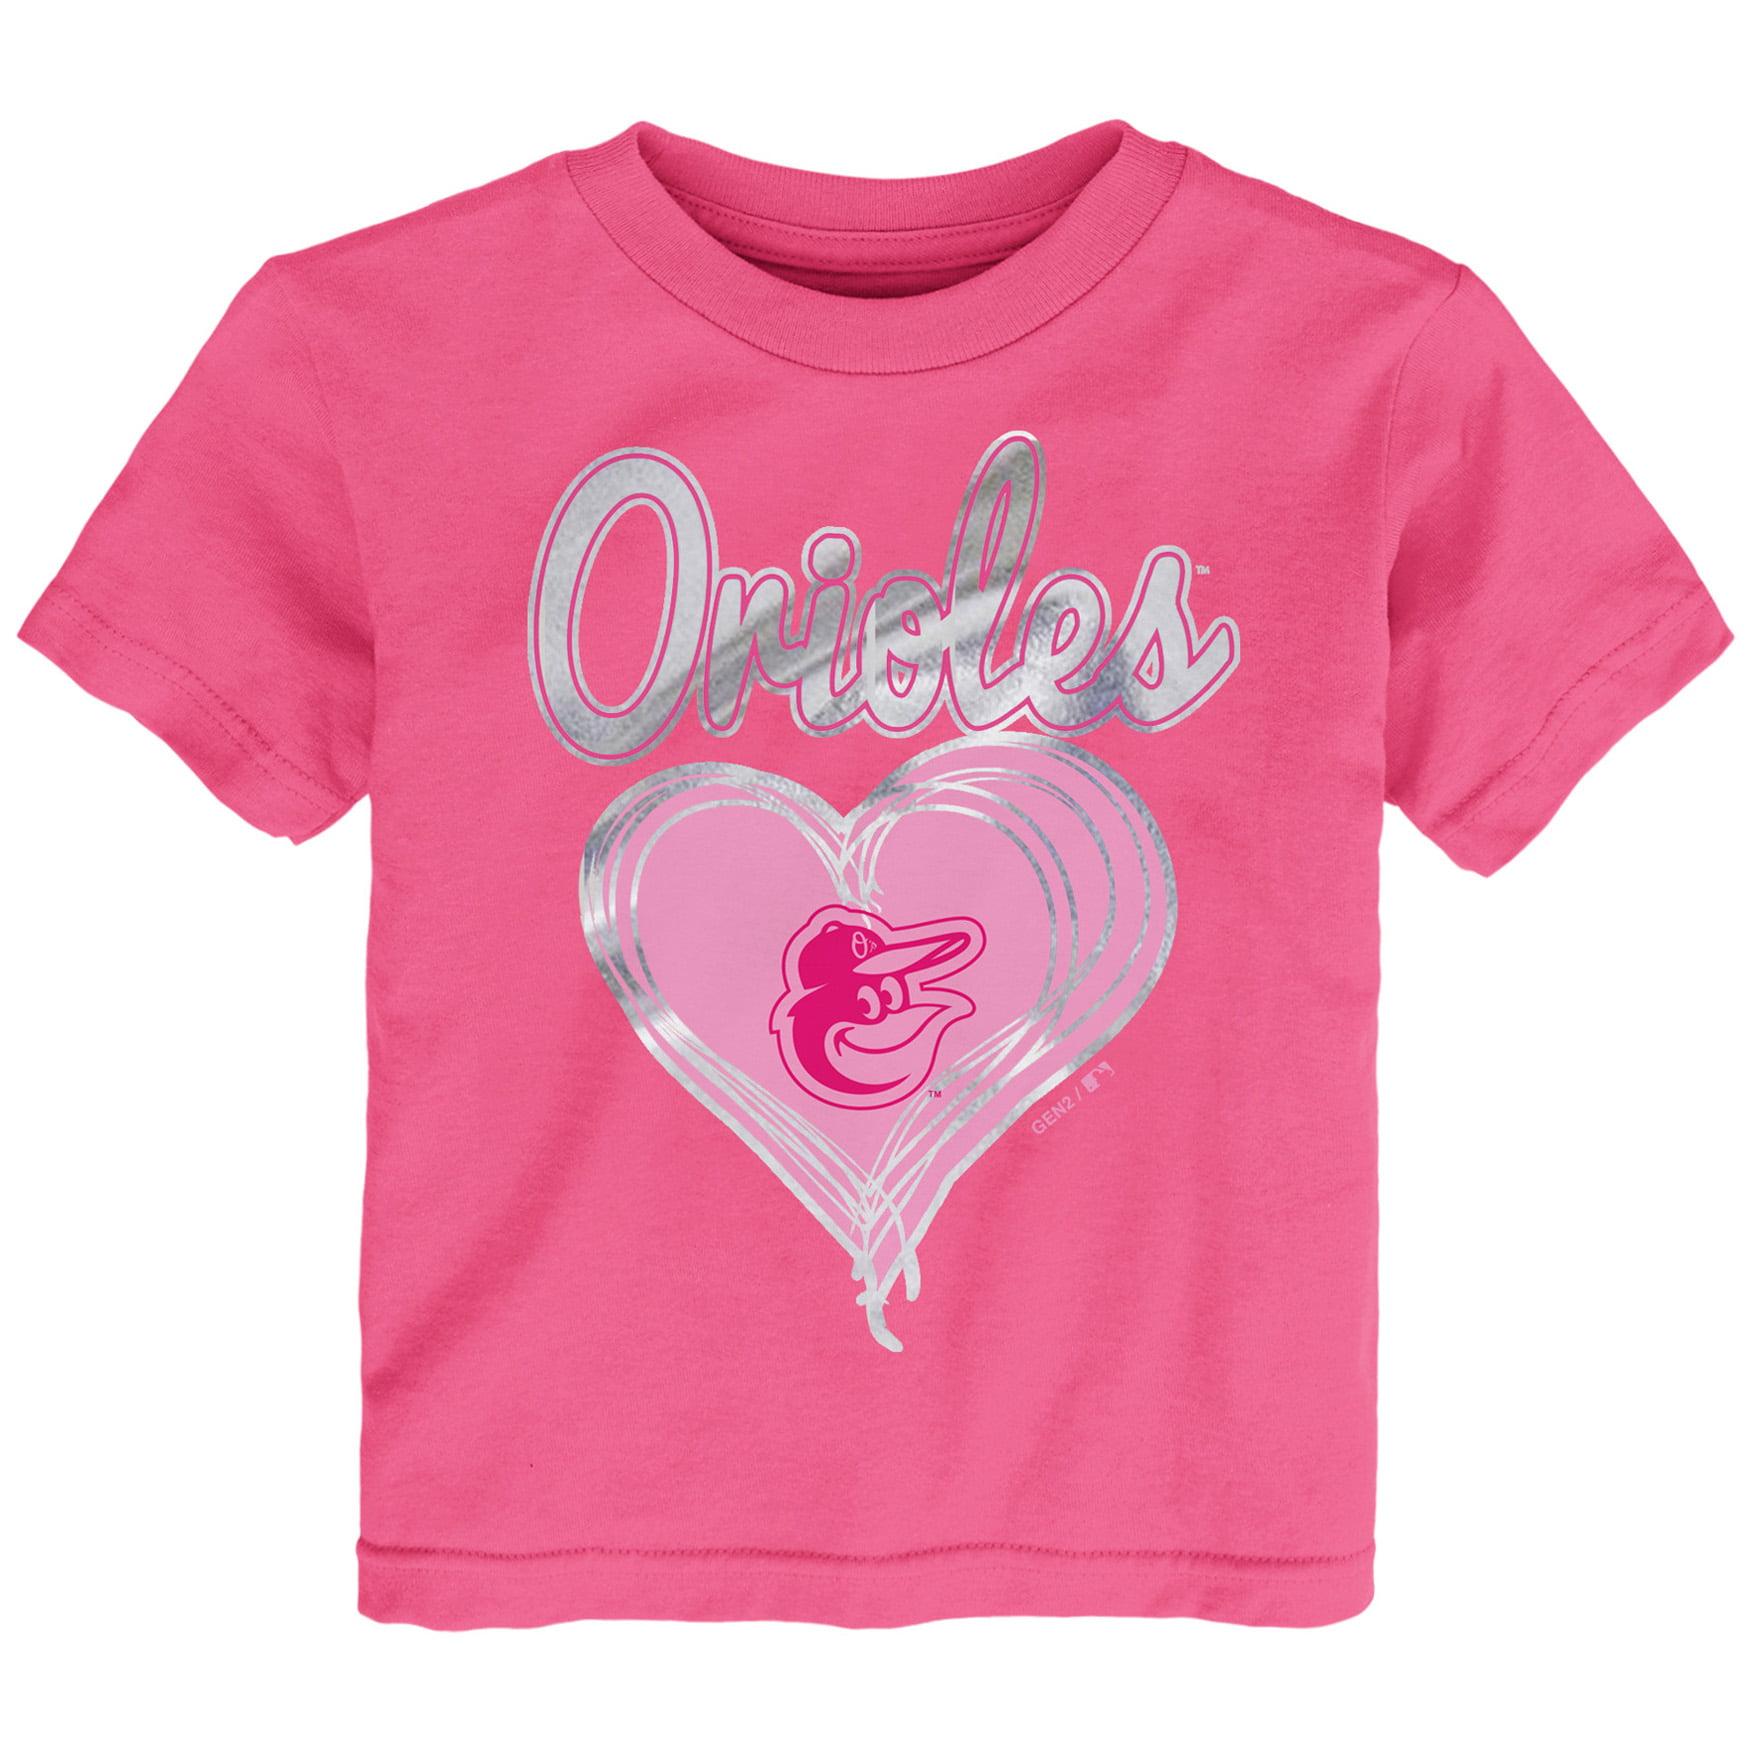 Baltimore Orioles Girls Preschool Unfoiled Love T-Shirt - Pink